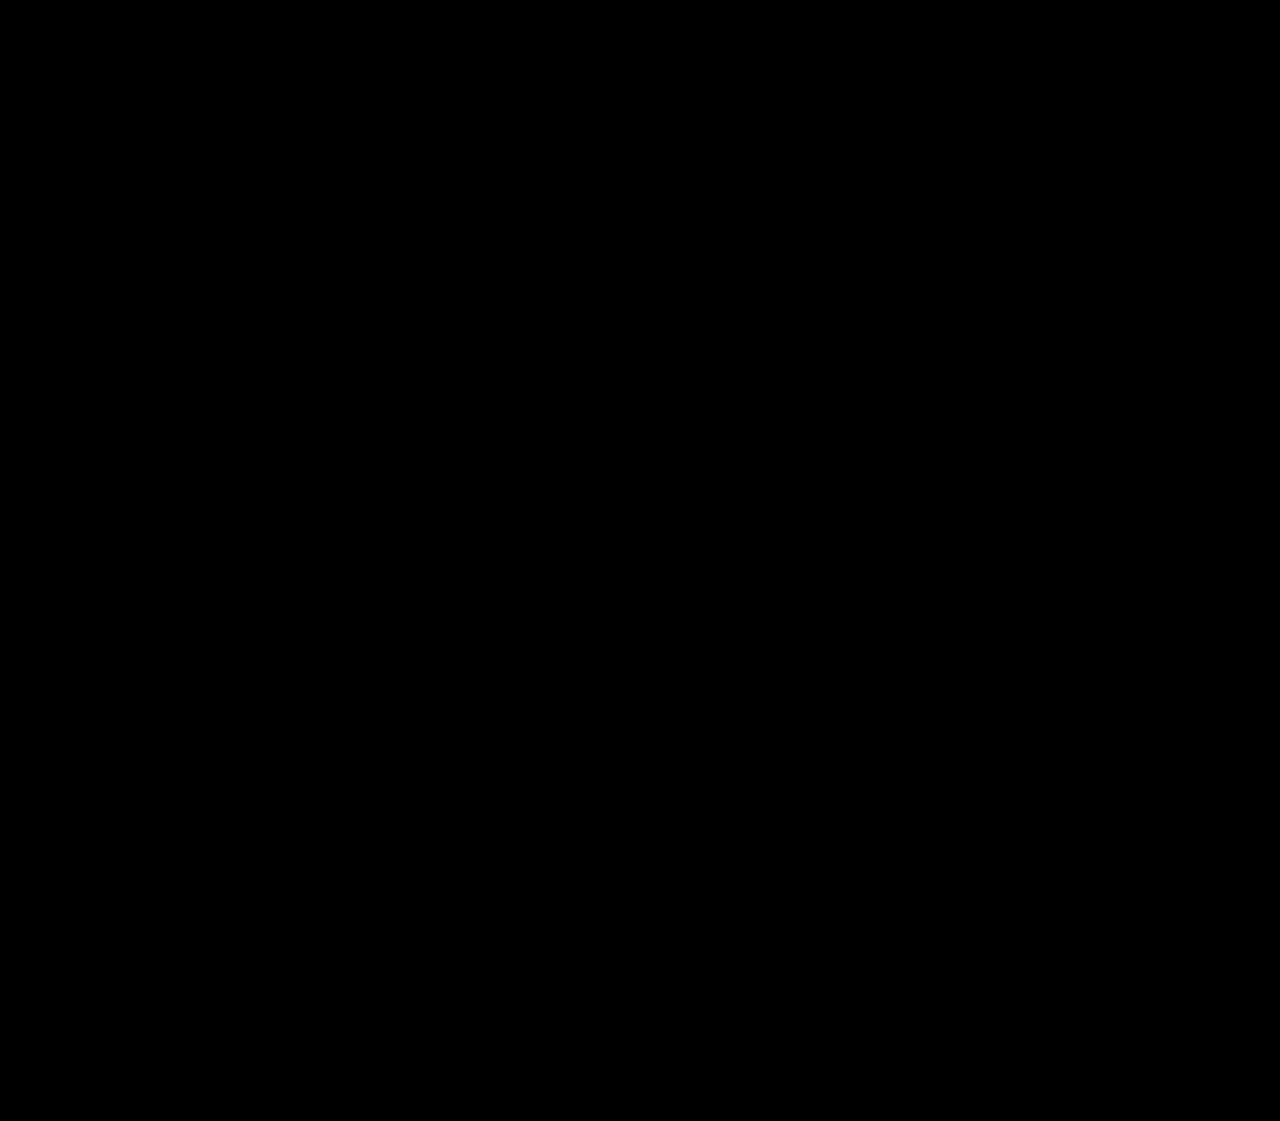 птица горлица рисунок